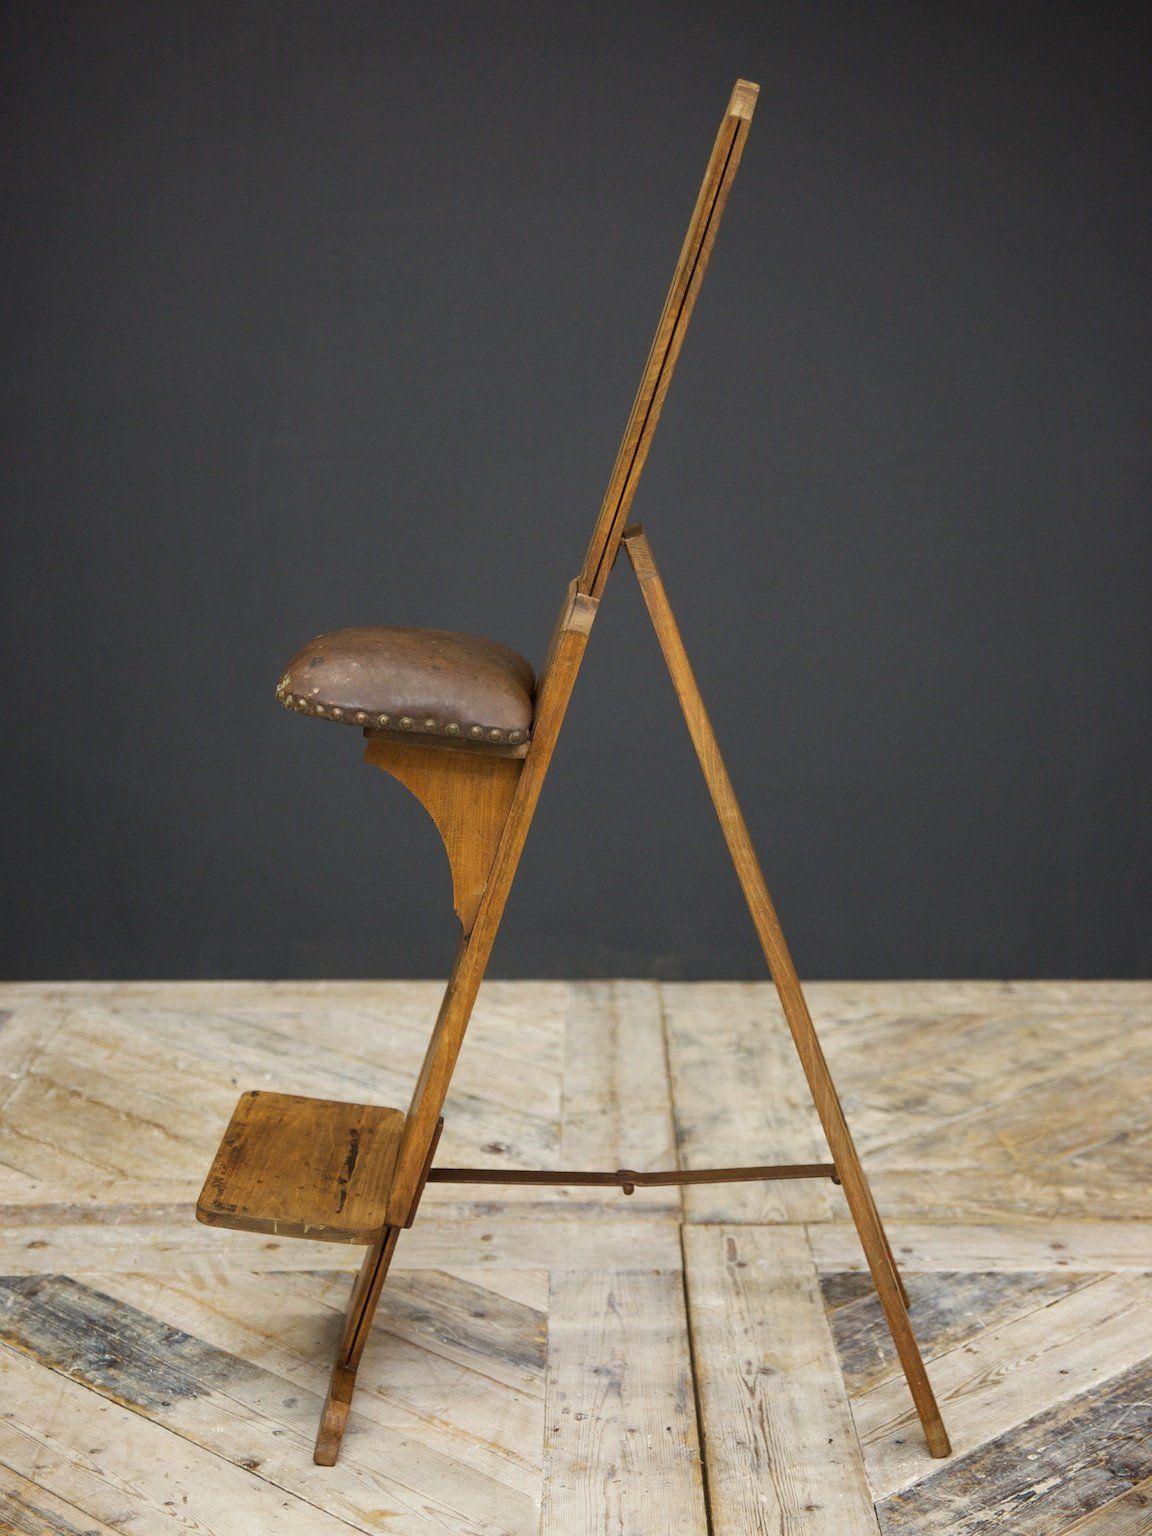 Artists Chair Artist Chair Artist Stool Chair